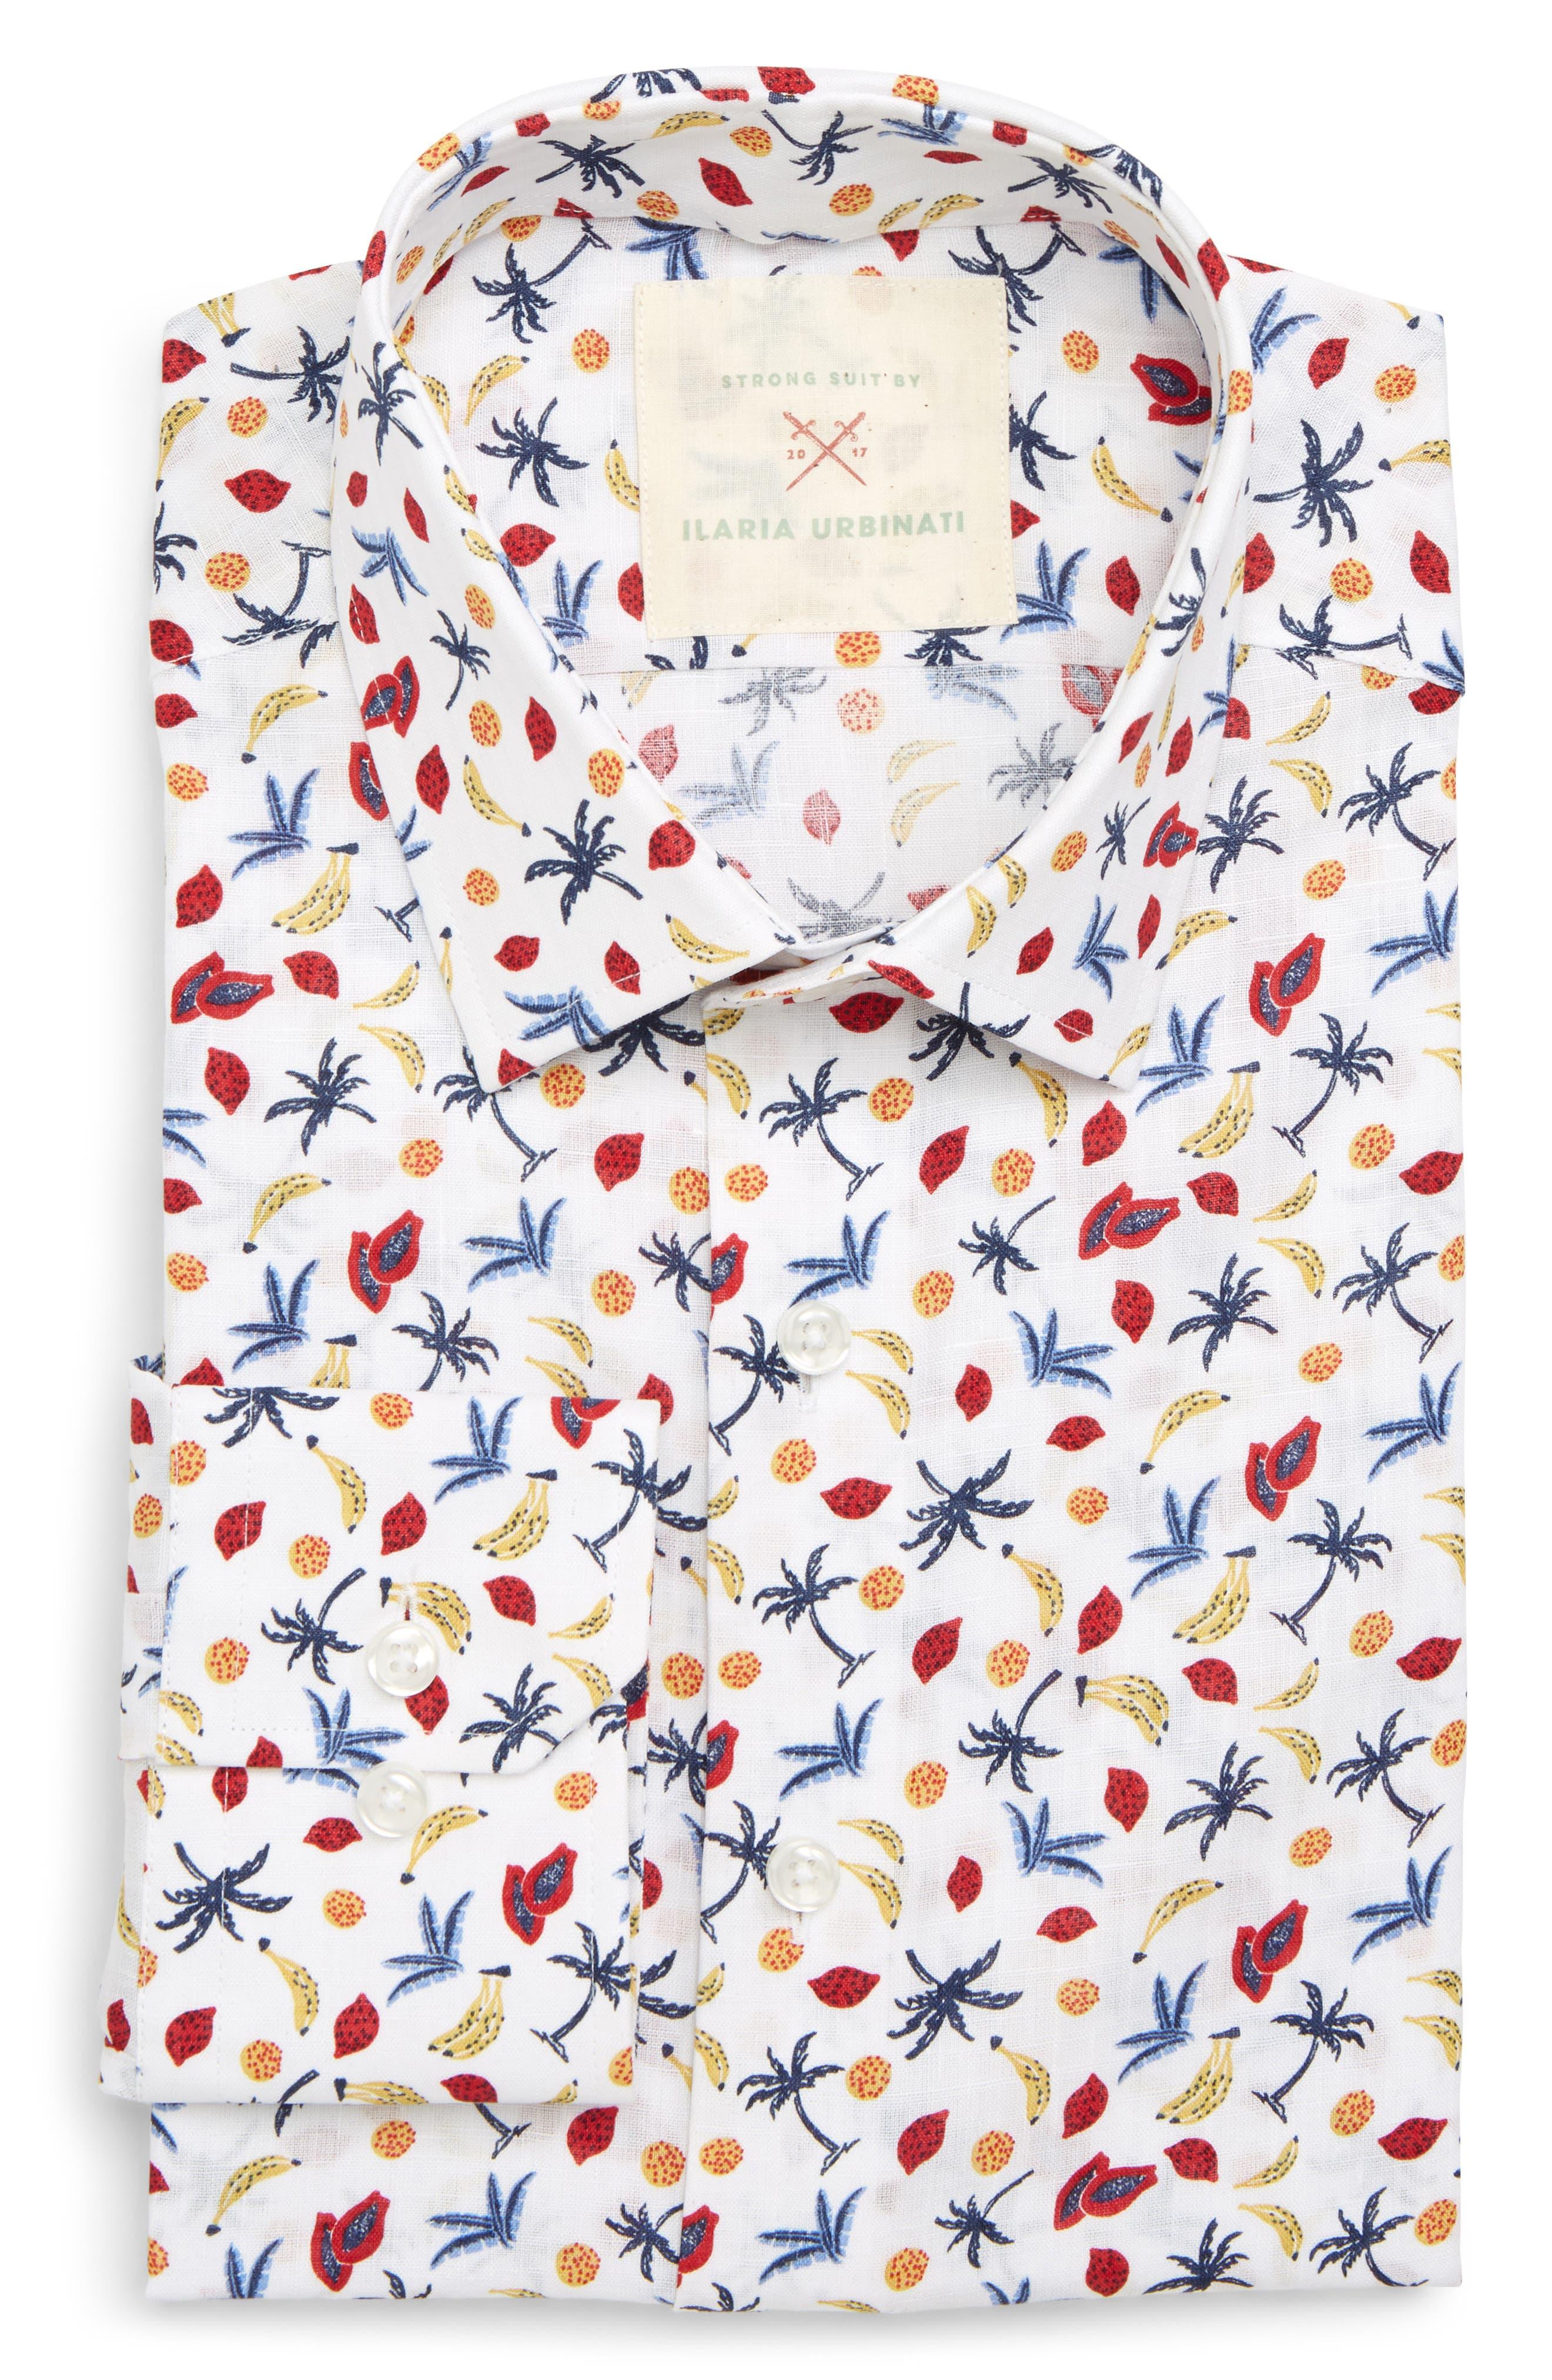 by Ilaria Urbinati Slim Fit Tropical Print Dress Shirt,                             Main thumbnail 1, color,                             410